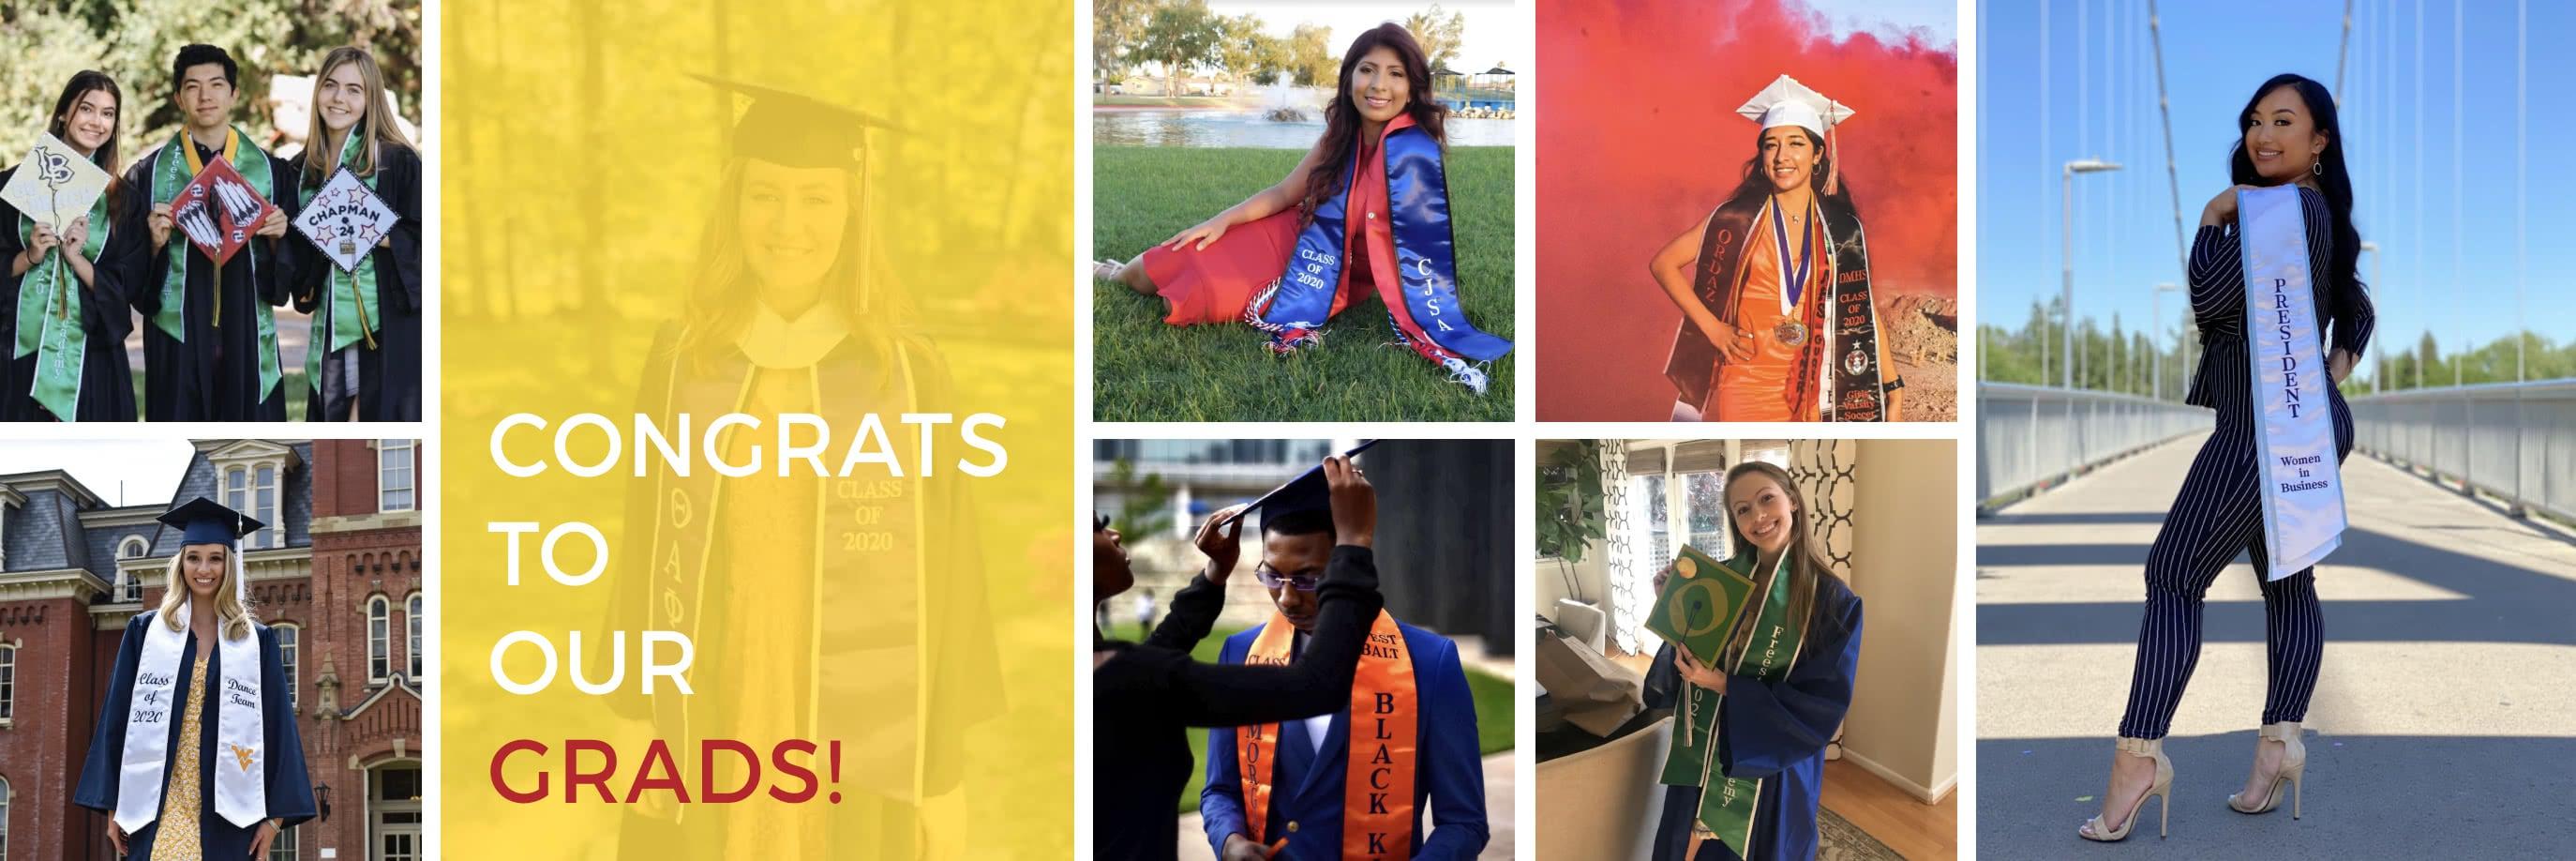 Congrats To Our Grads!